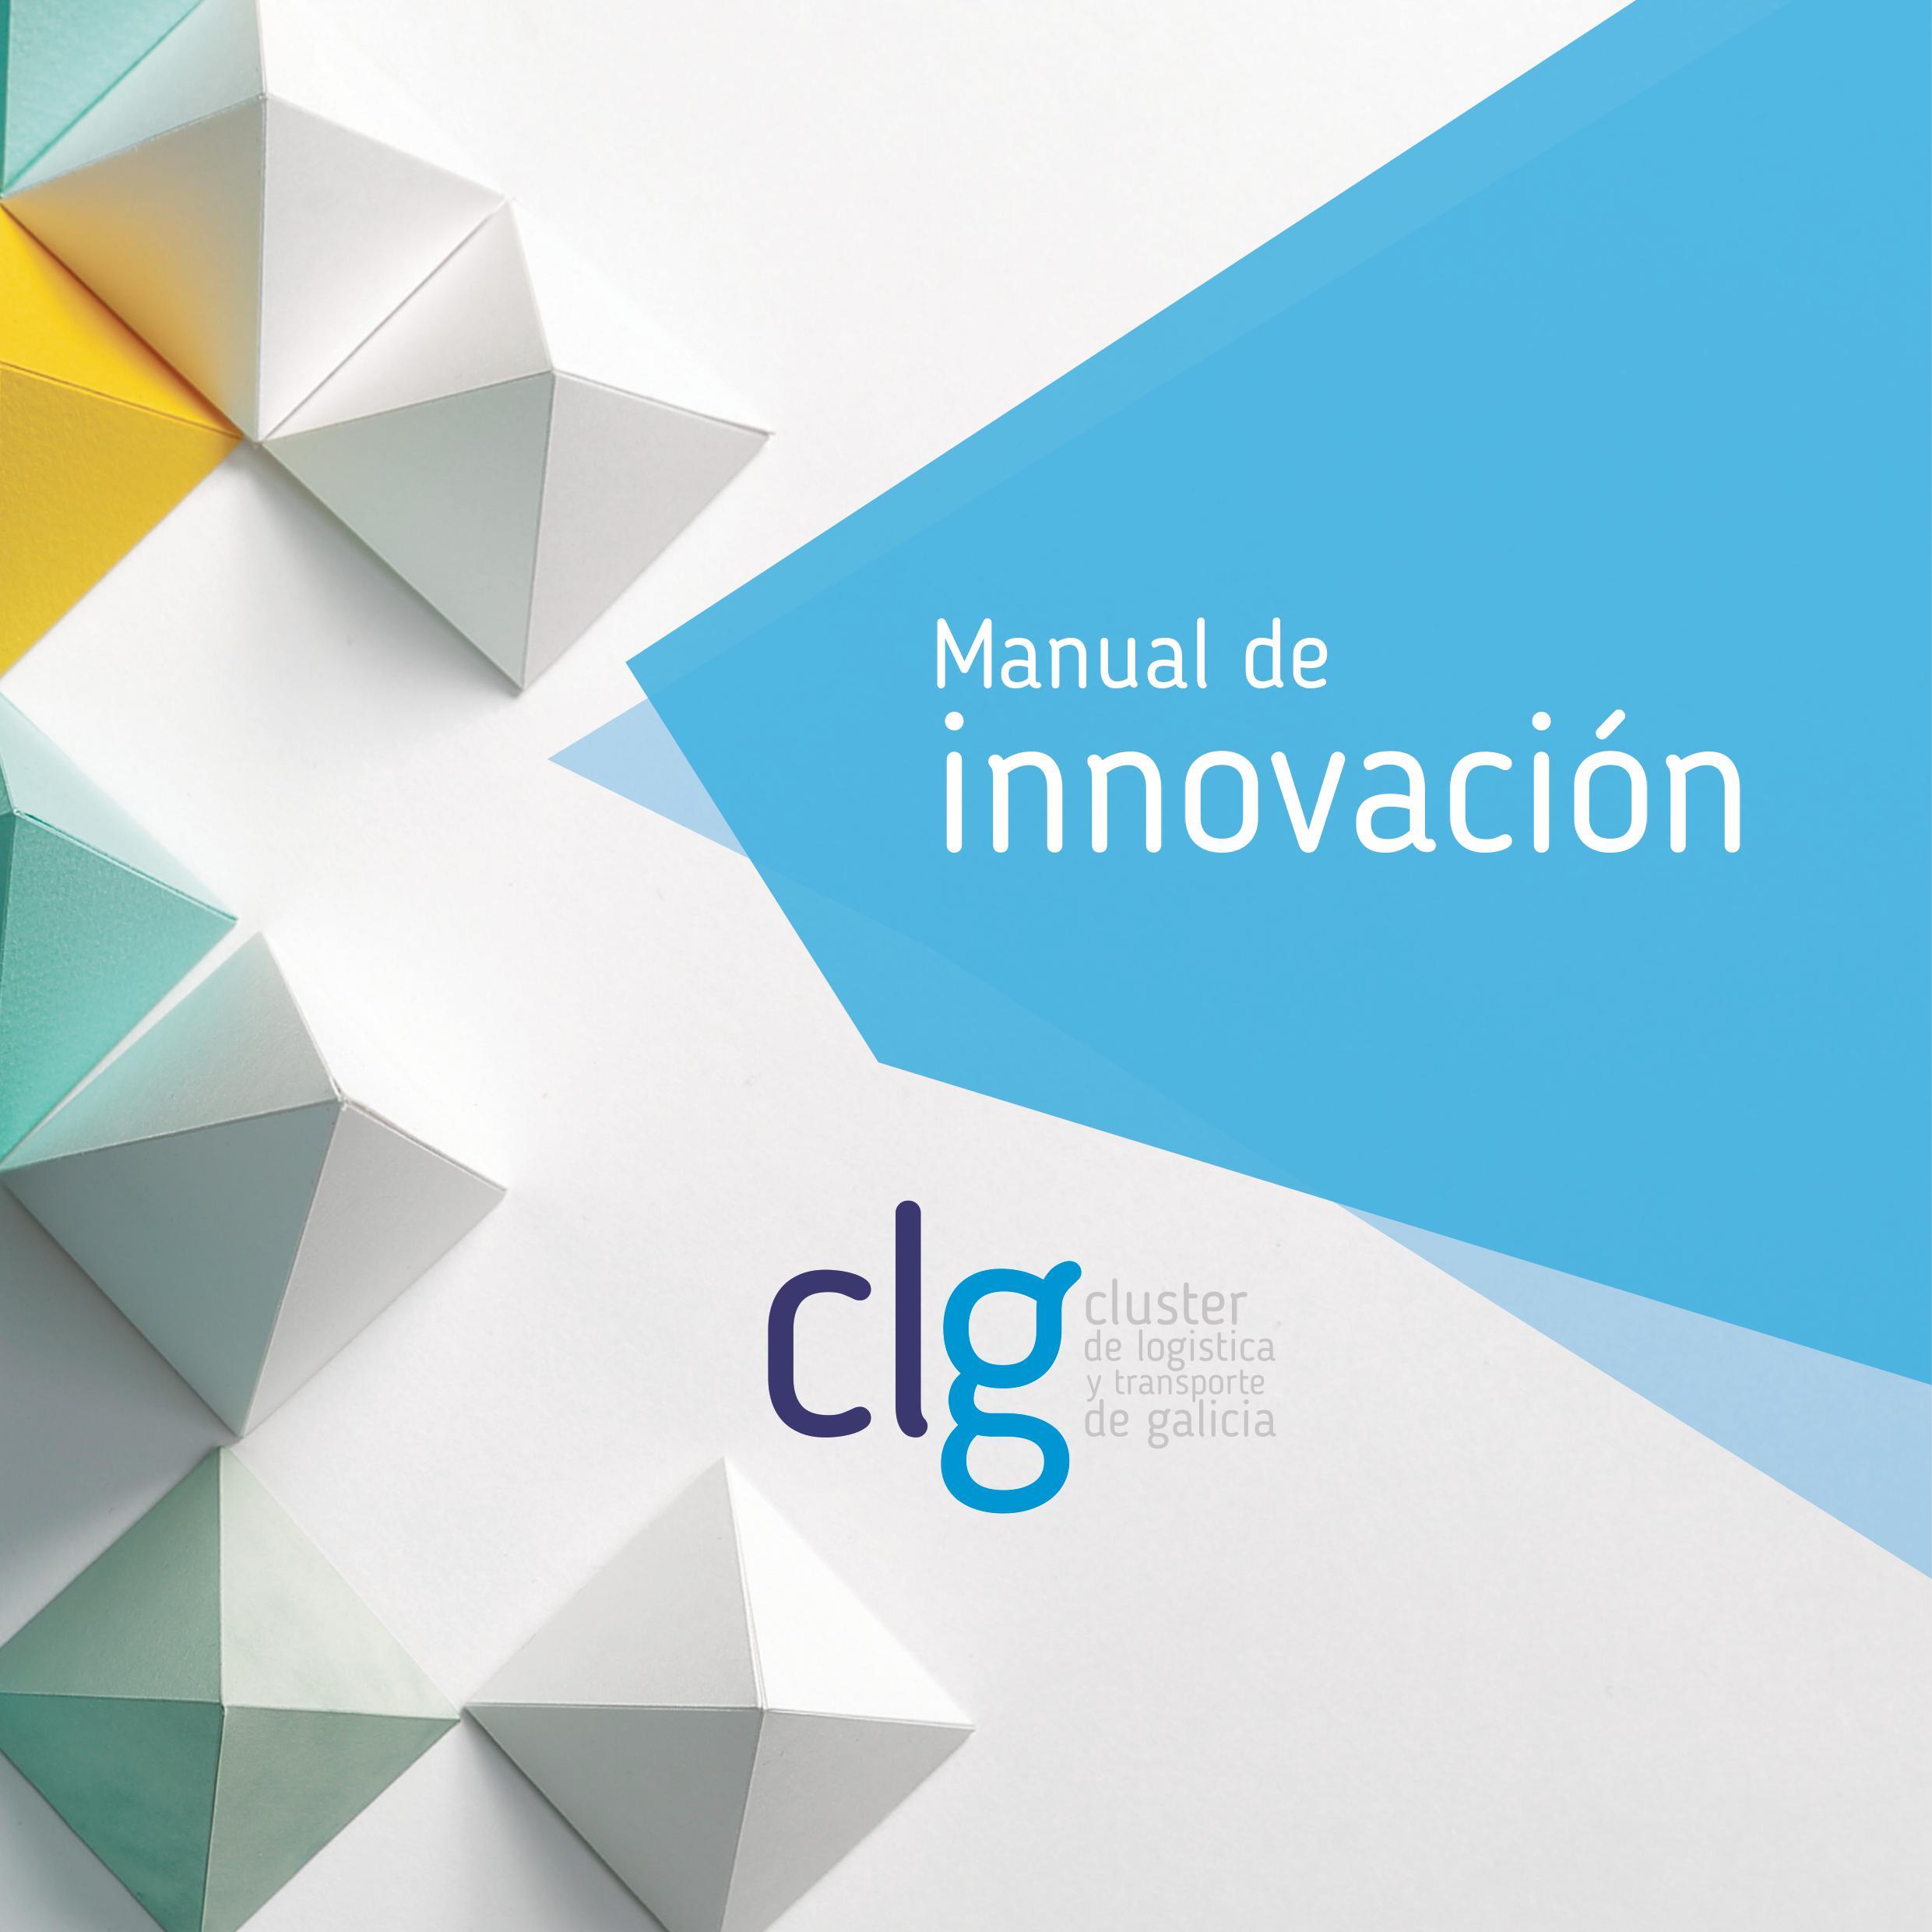 Manual de innovación